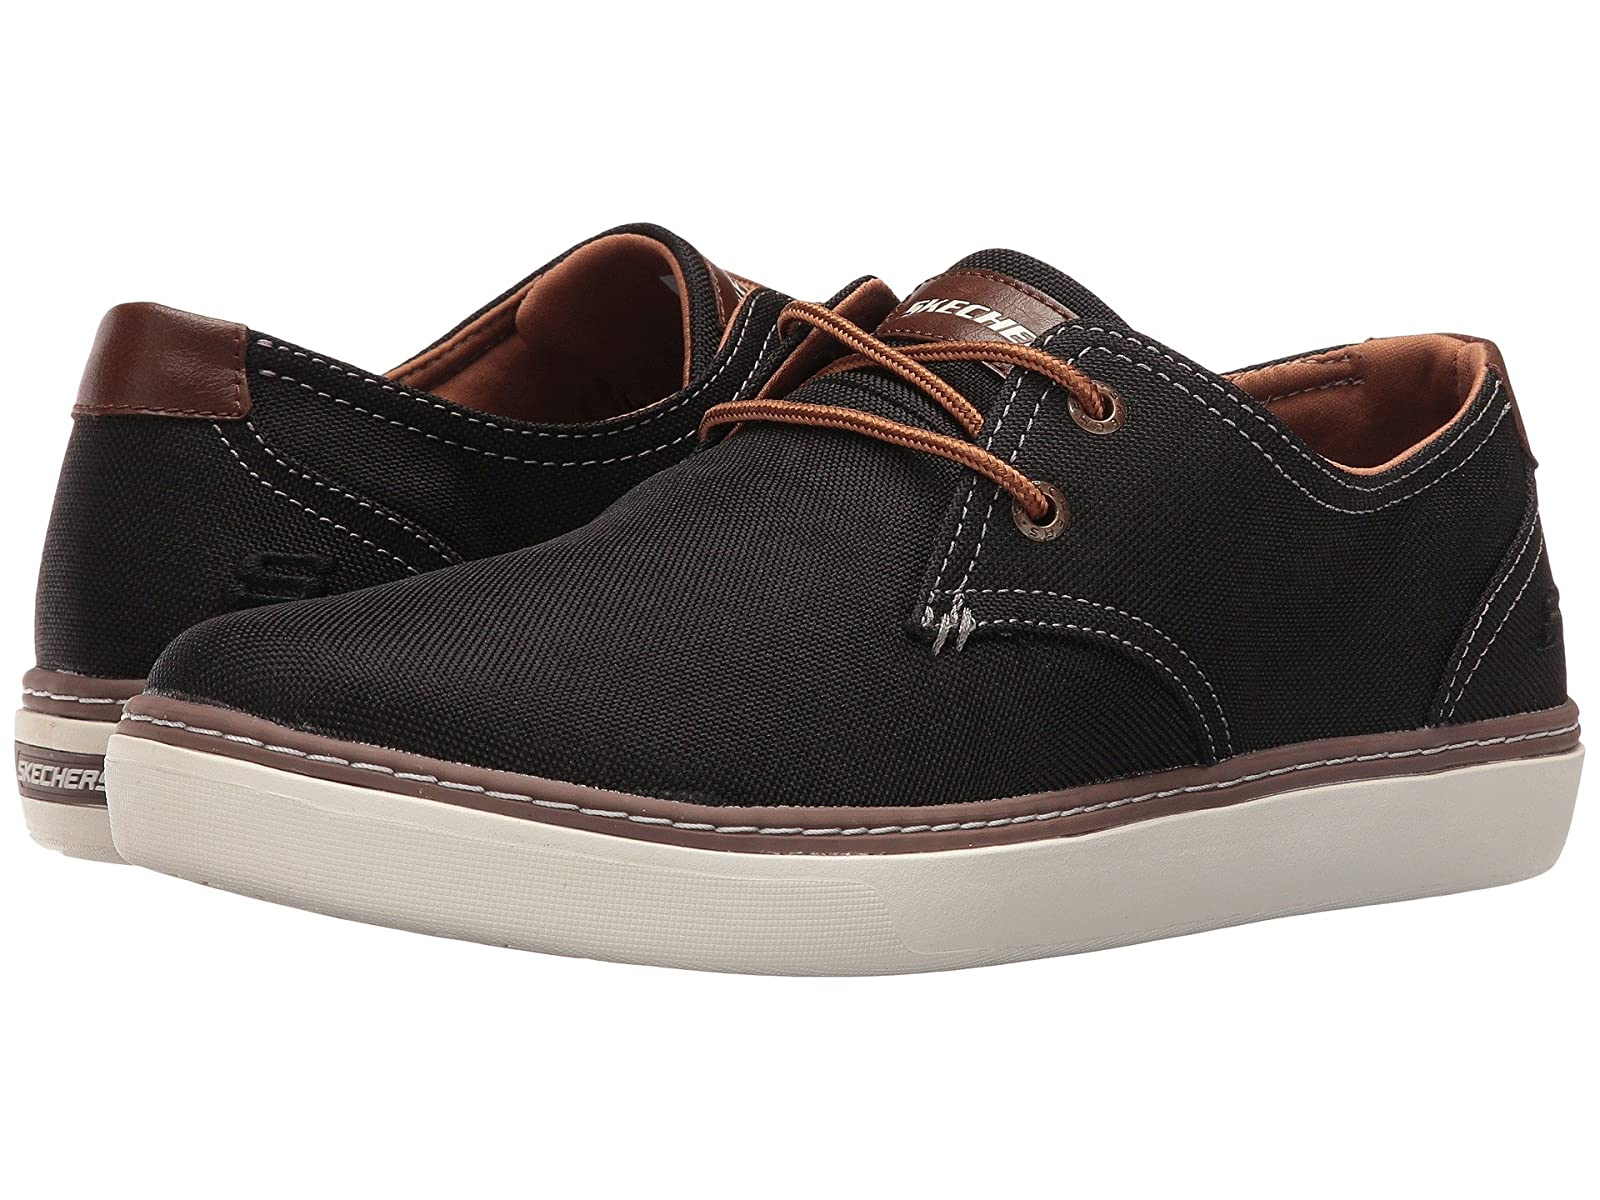 SKECHERS Relaxed Fit Palen - GadonAtmospheric grades have affordable shoes